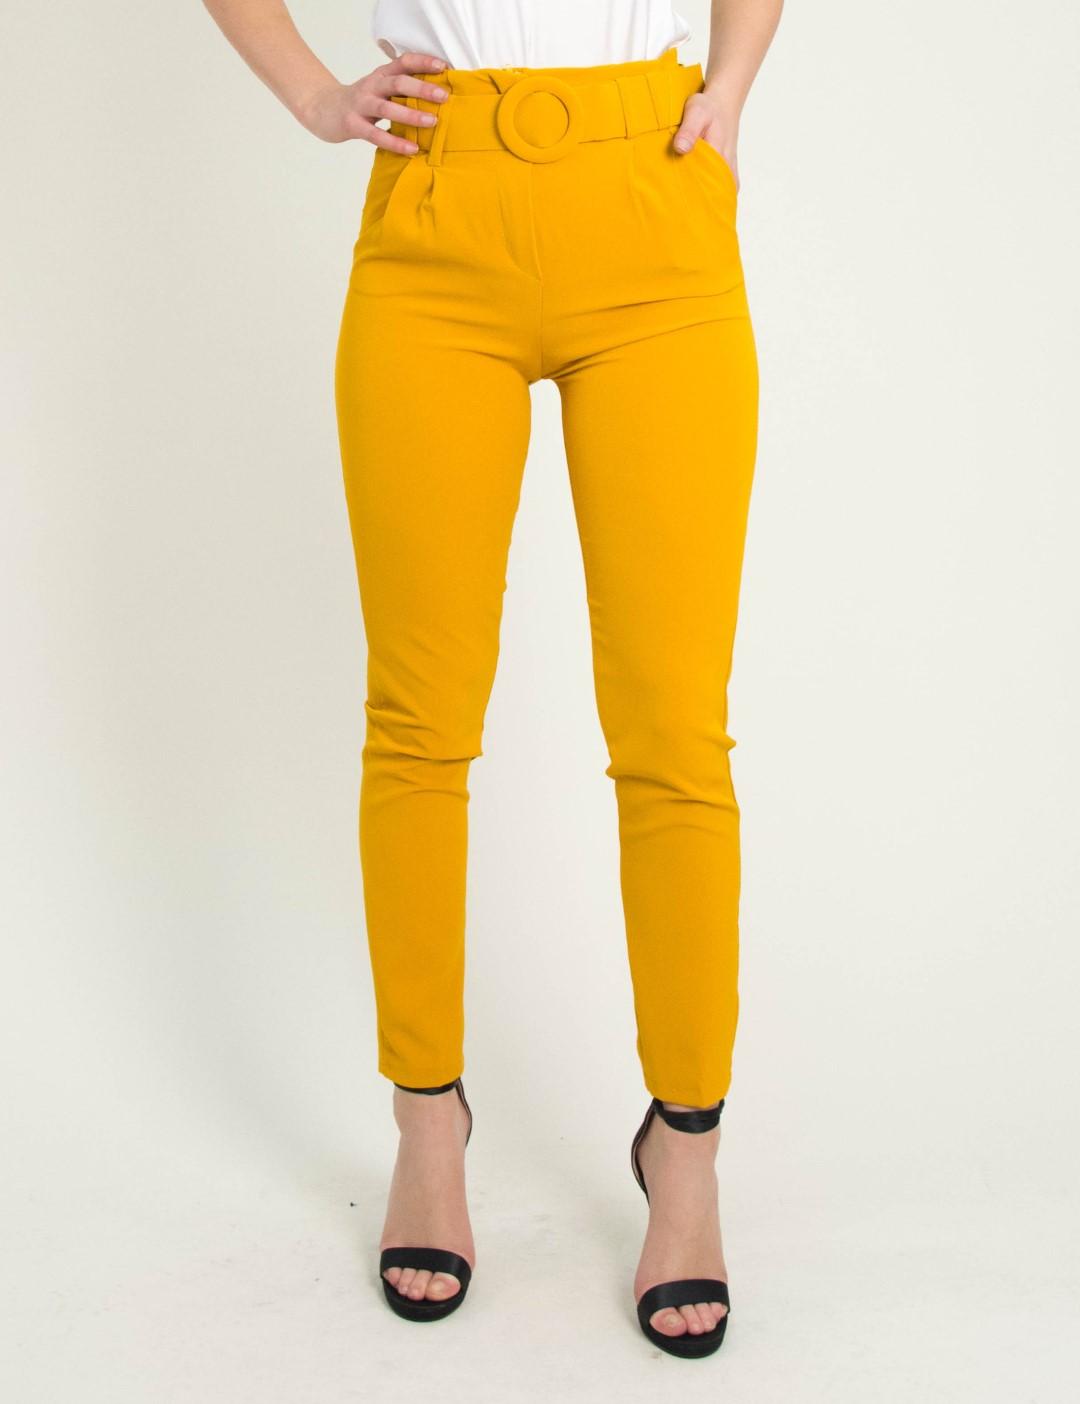 a1f26c757c04 Γυναικείο ώχρα ψηλόμεσο παντελόνι με ζώνη 20063G